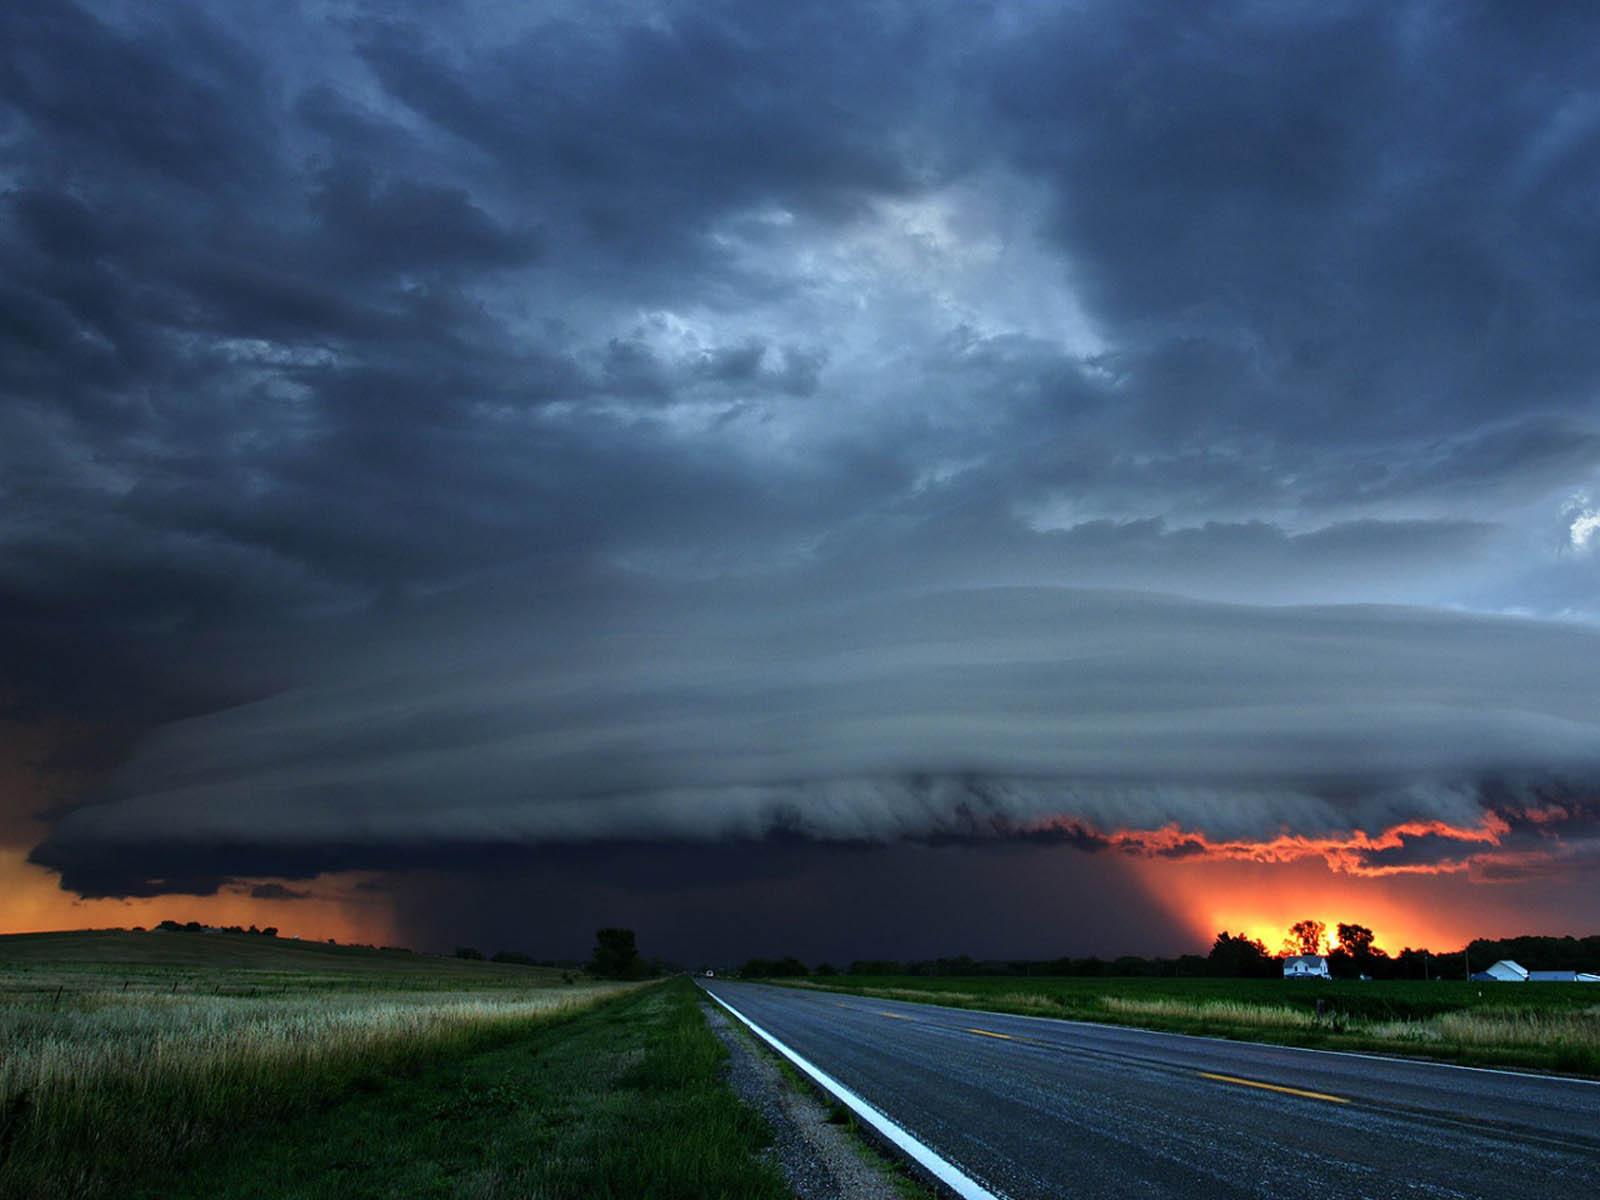 wallpaper: Tornado Paos